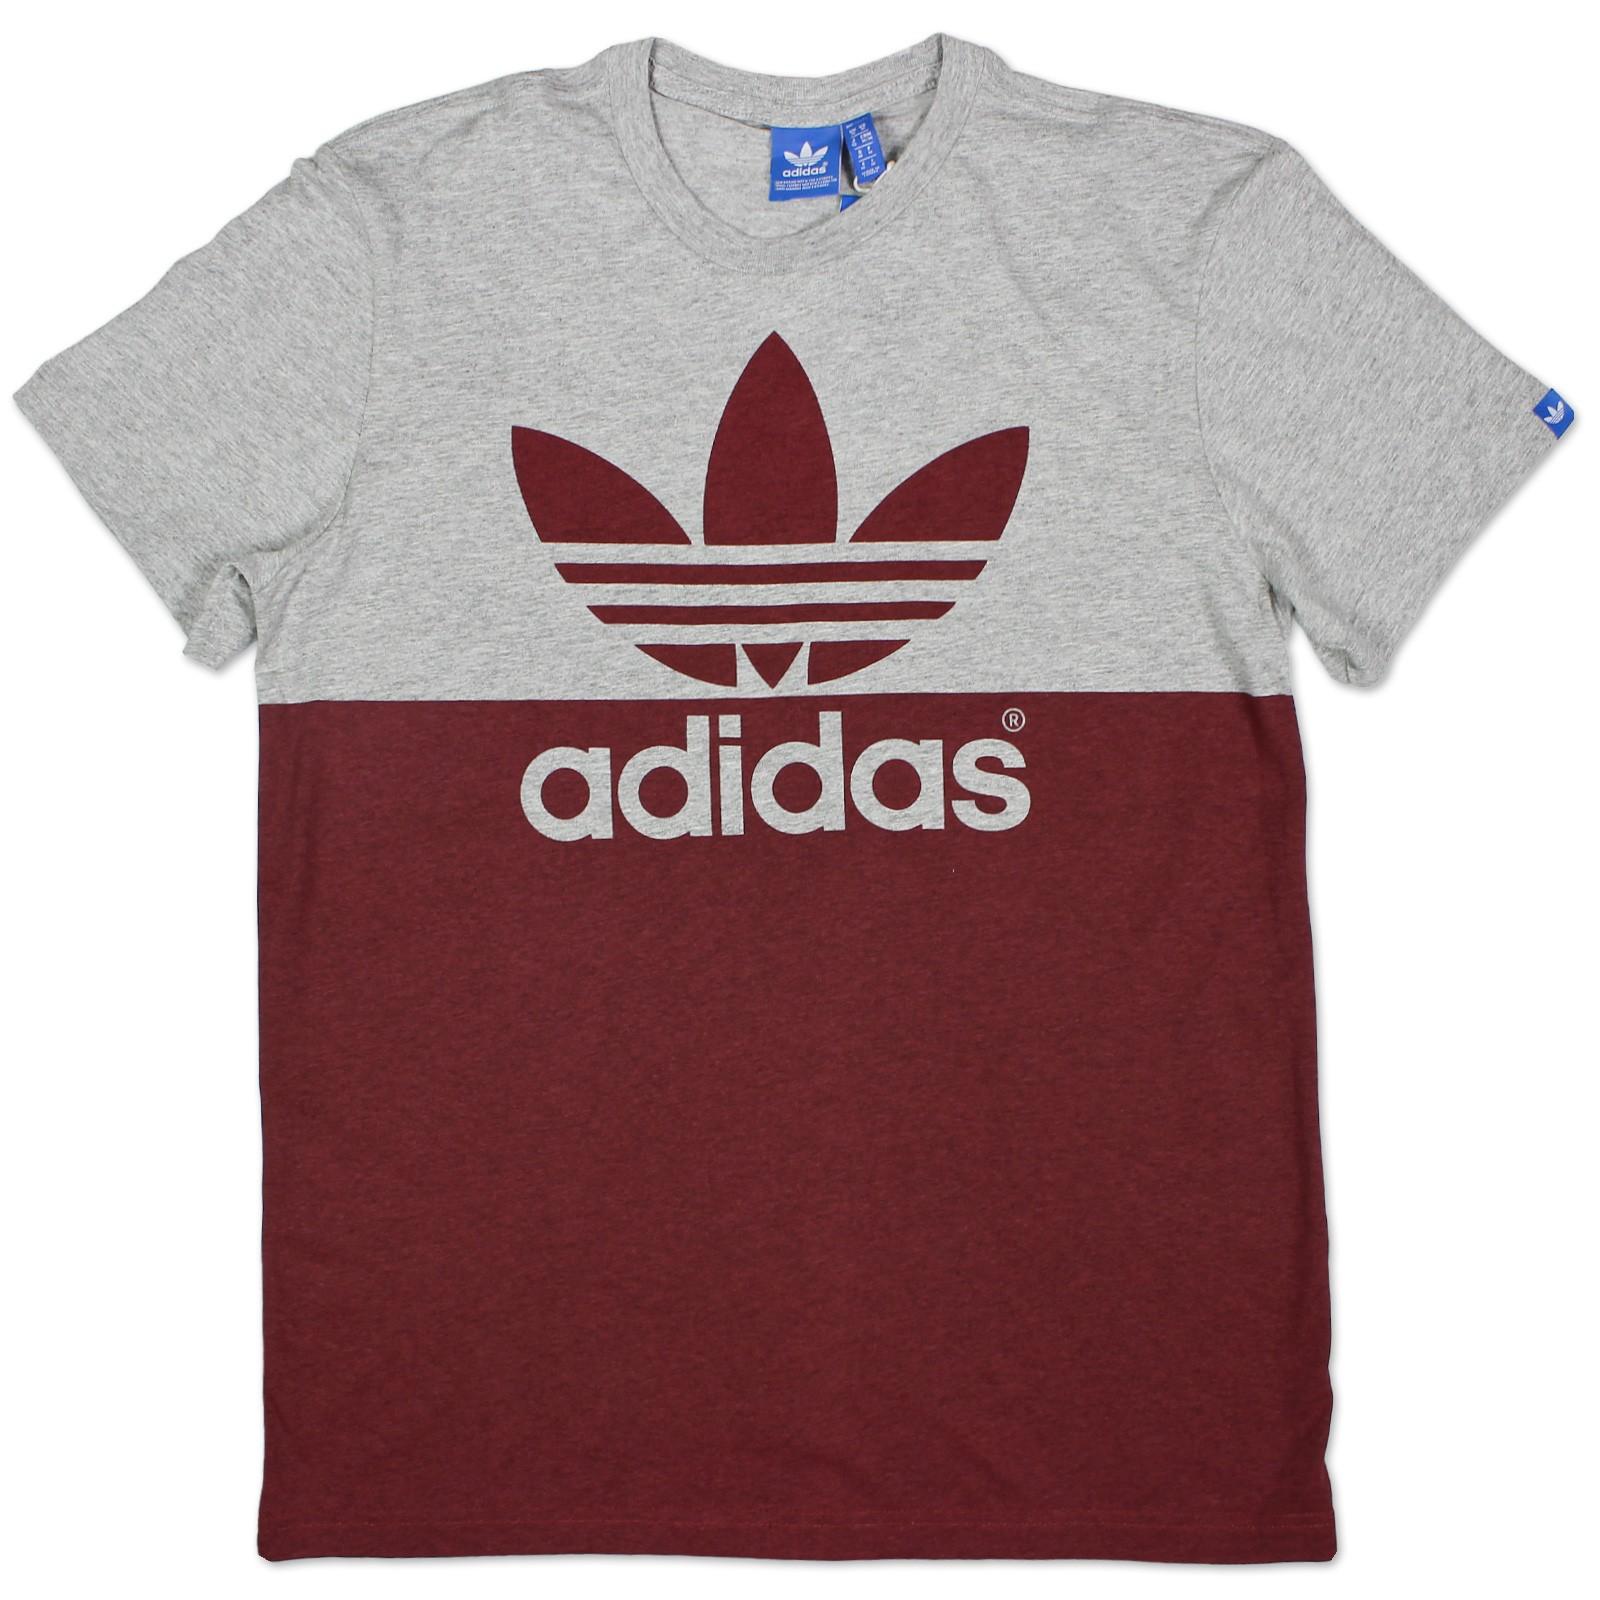 Details about Adidas Originals Graphic Colorblock Trefoil Tee Shirt Mens Grey Dark Red M show original title